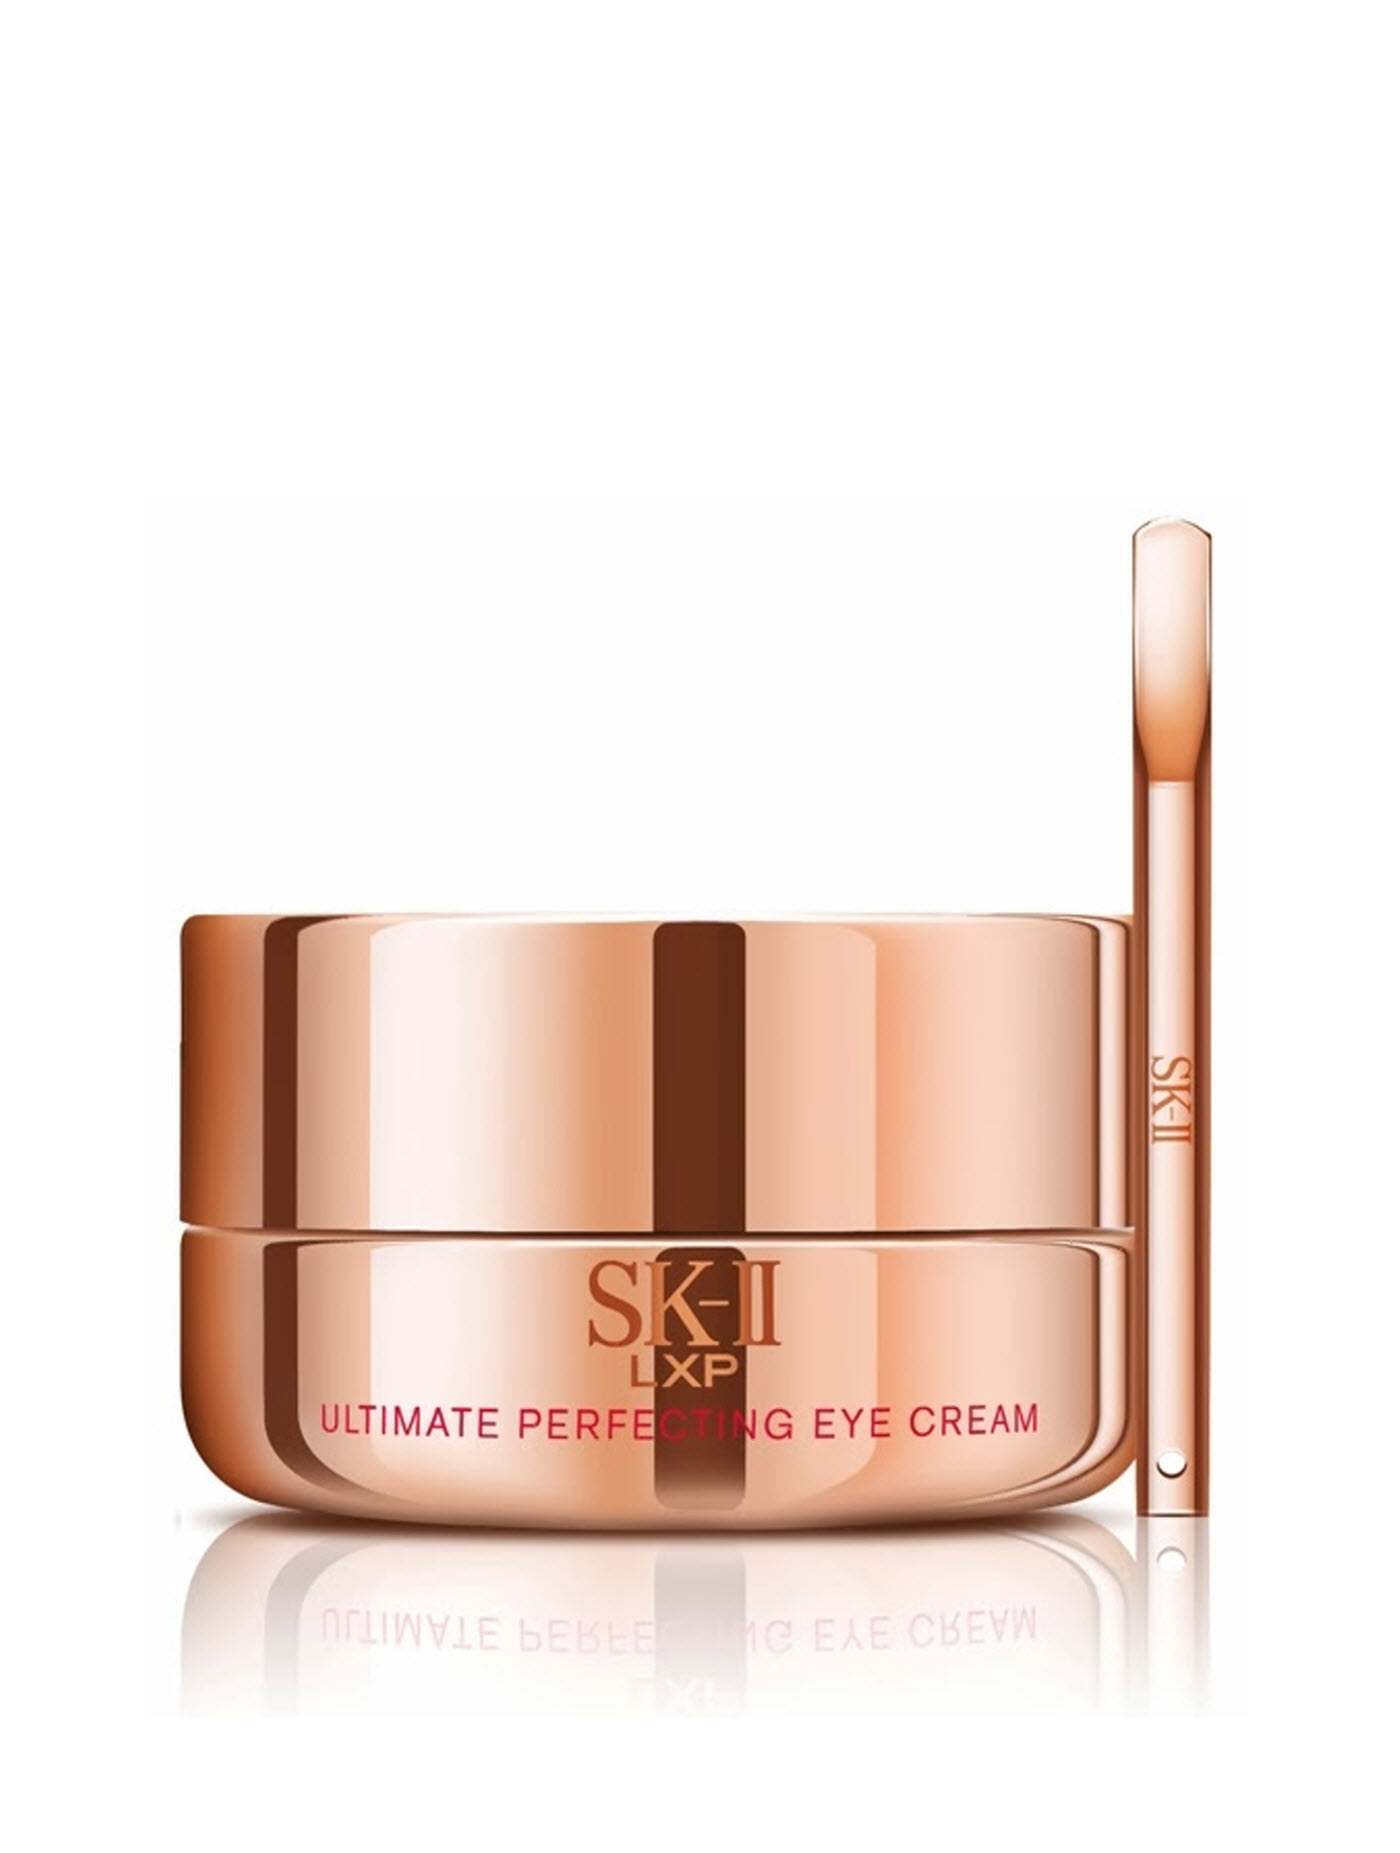 SK-II อายครีมประสิทธิภาพสูง LXP Ultimate Perfecting Eye Cream